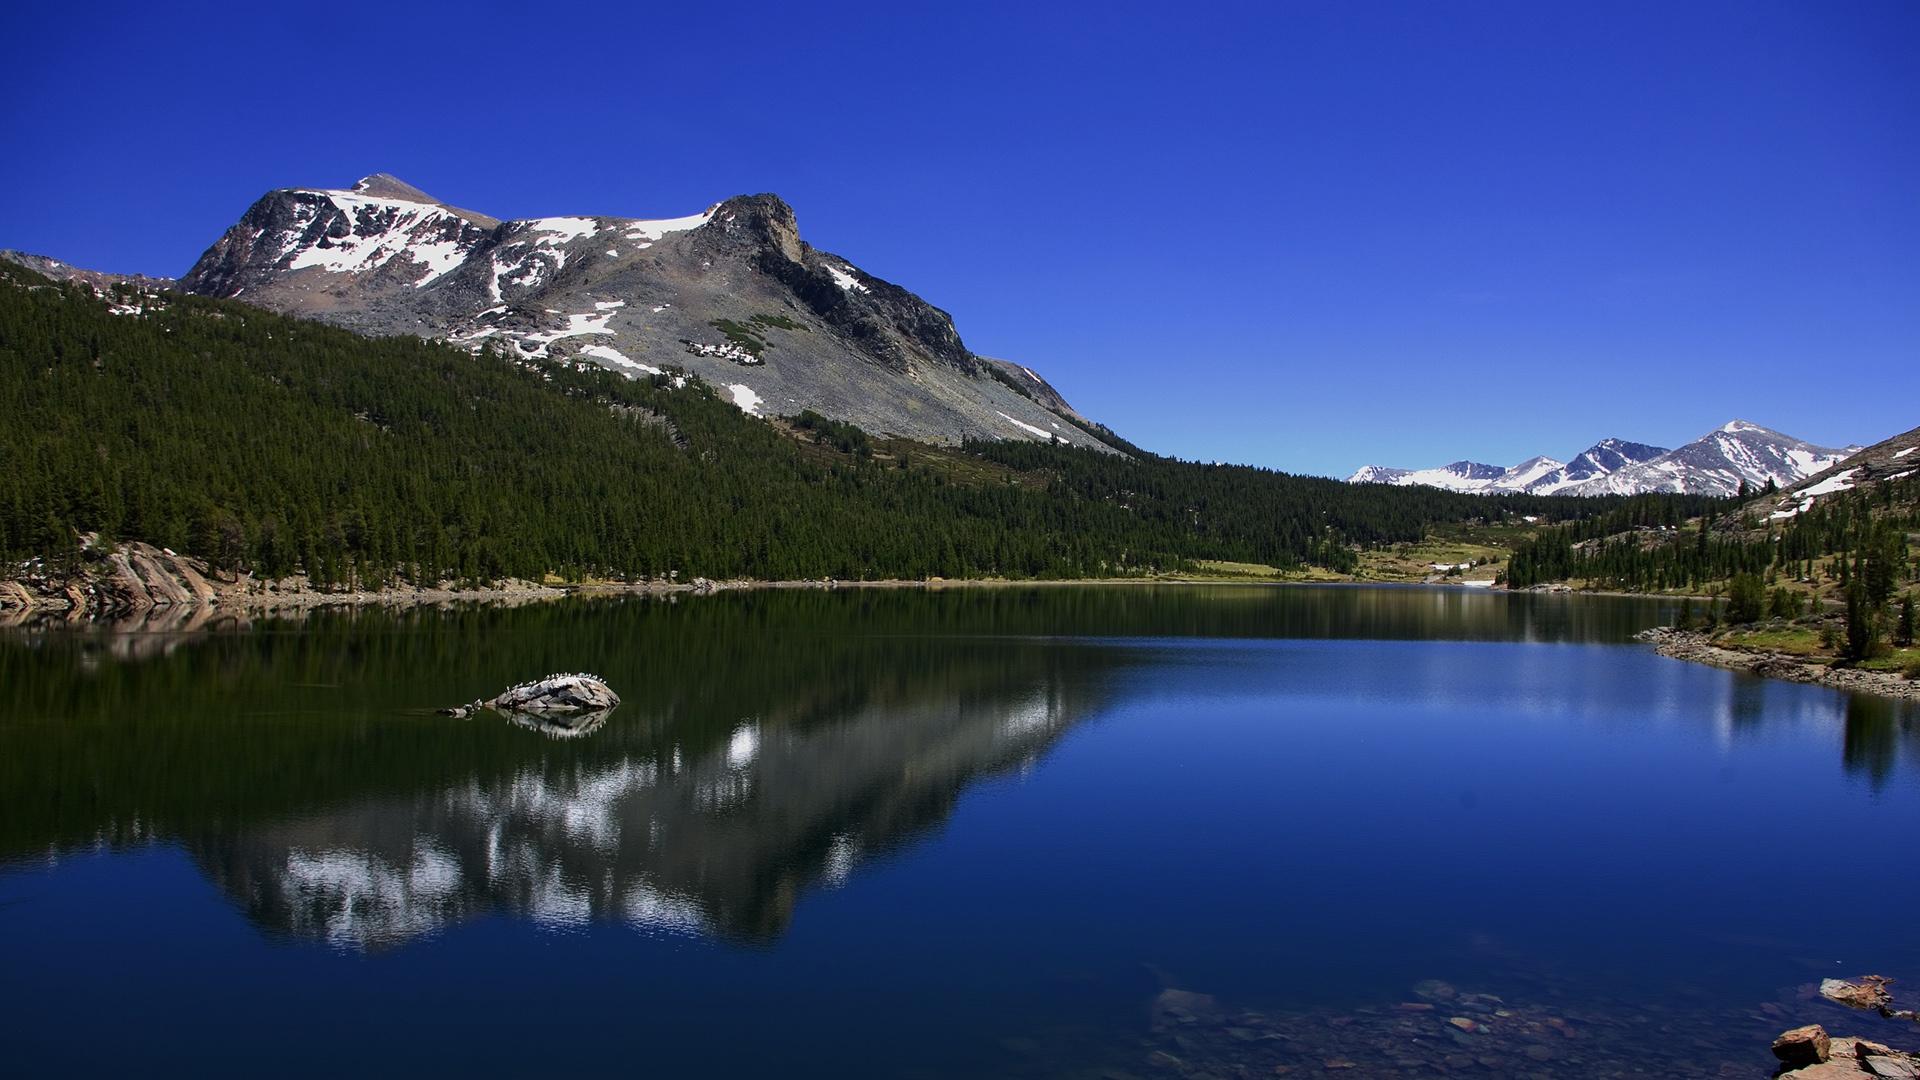 Landscape Beautiful Mountain Wallpapers Xpx Wallpaper Hd